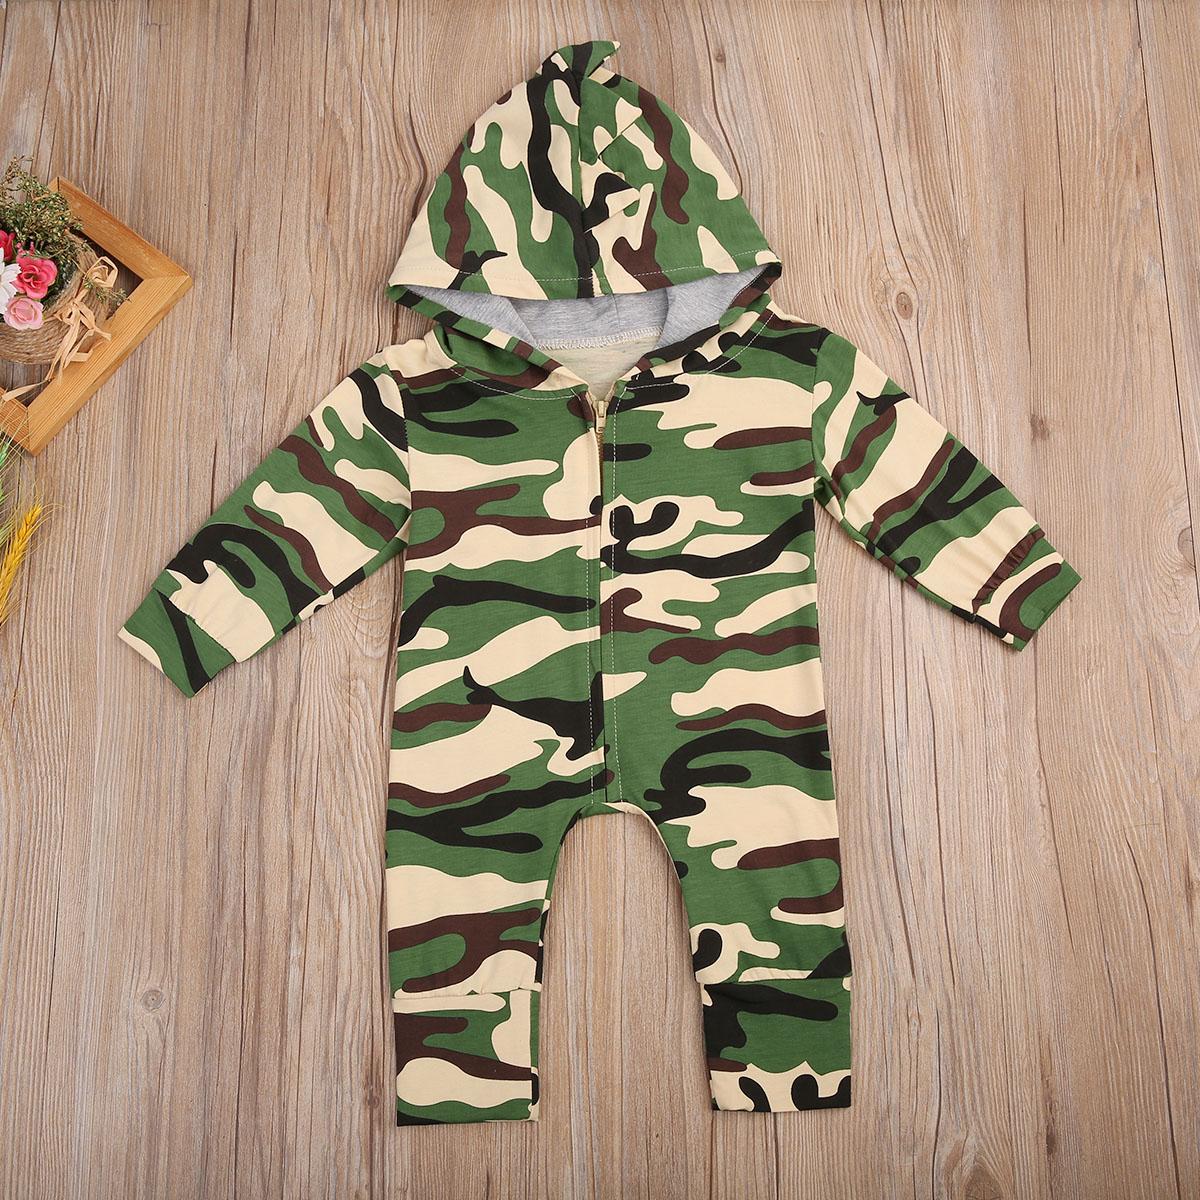 Newborn Anak Bayi Laki Perempuan Kapas Baju Monyet Lengan Panjang Jumpsuit Katun Lucu Outfit Pakaian Army Hijau Di Romper Dari Ibu